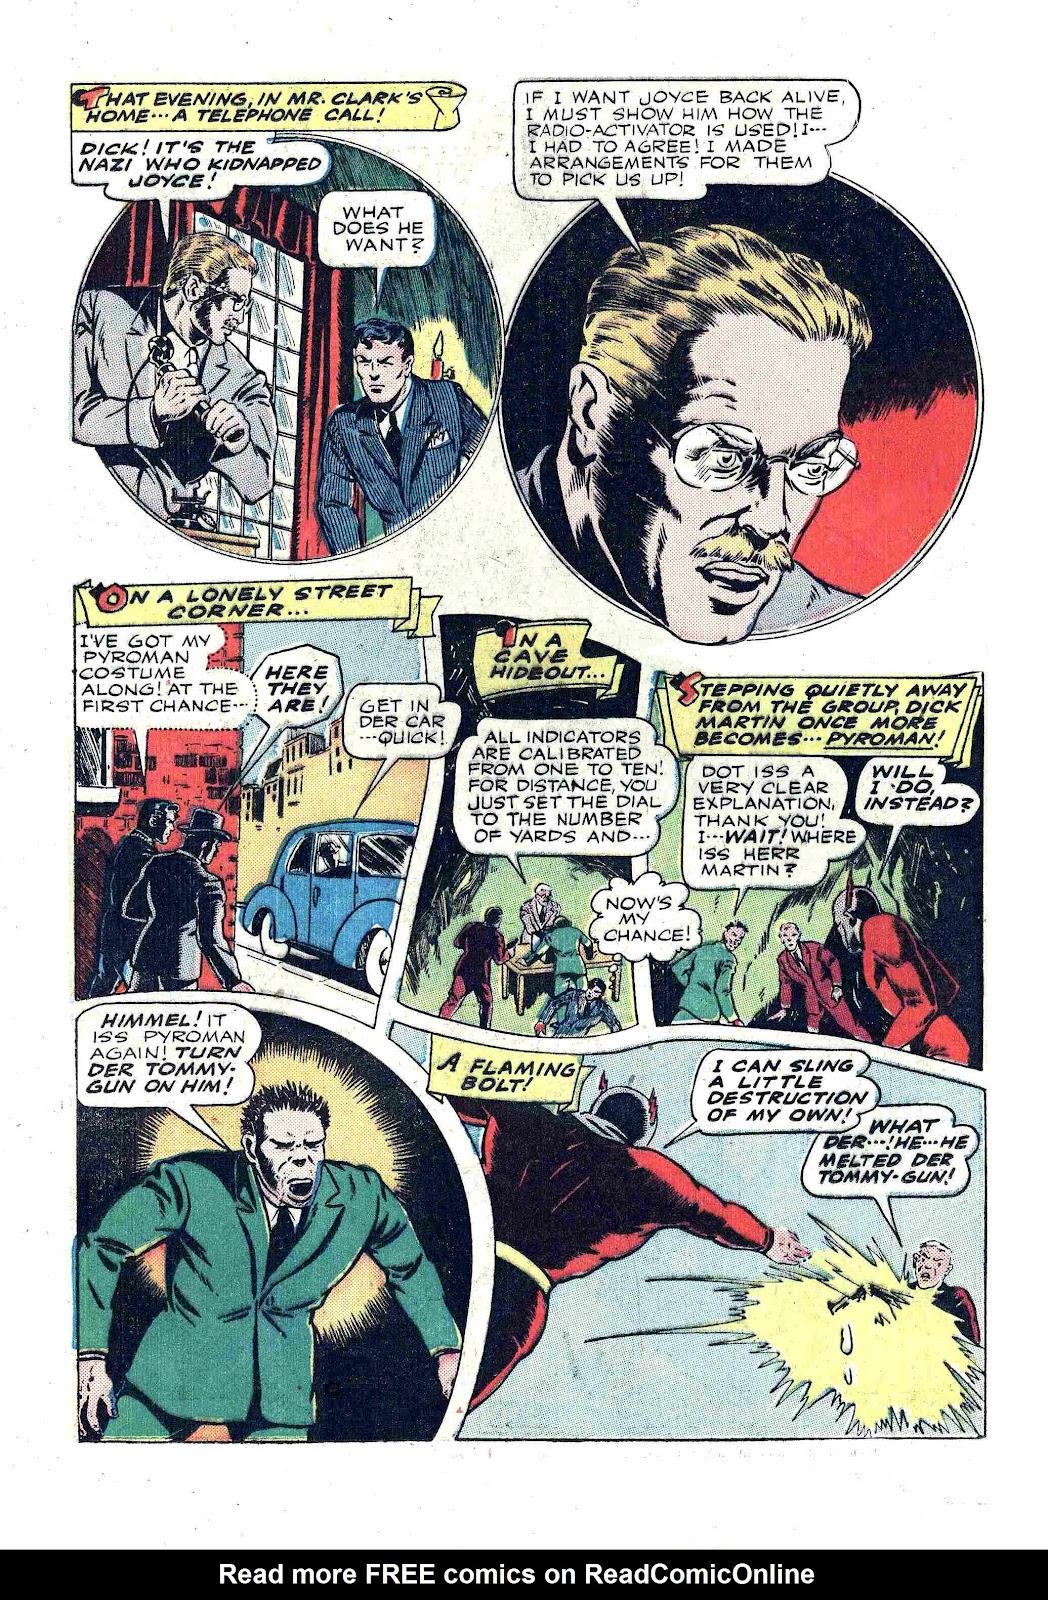 Read online America's Best Comics comic -  Issue #13 - 30